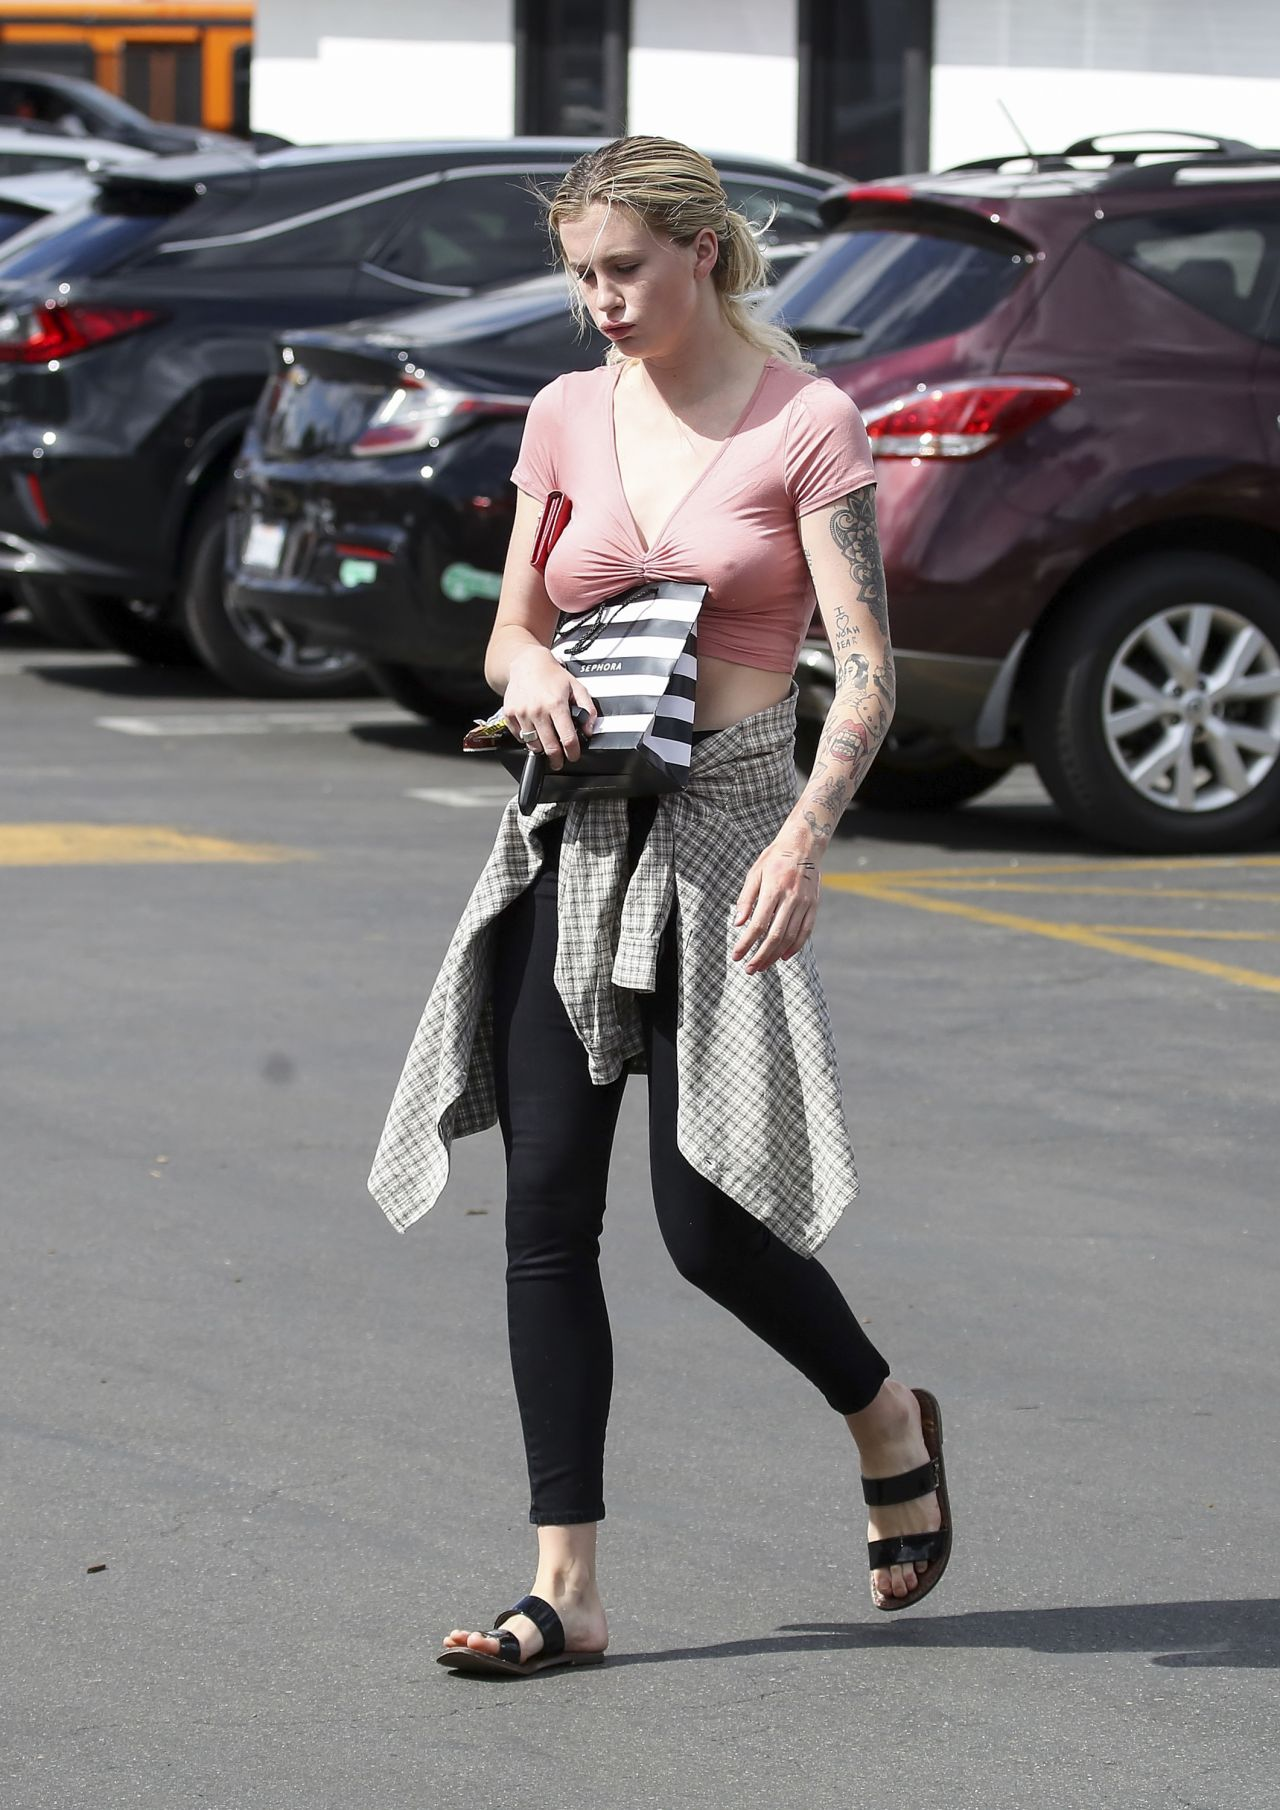 IRELAND BALDWIN Shopping at Sephora in Los Angeles 05/17